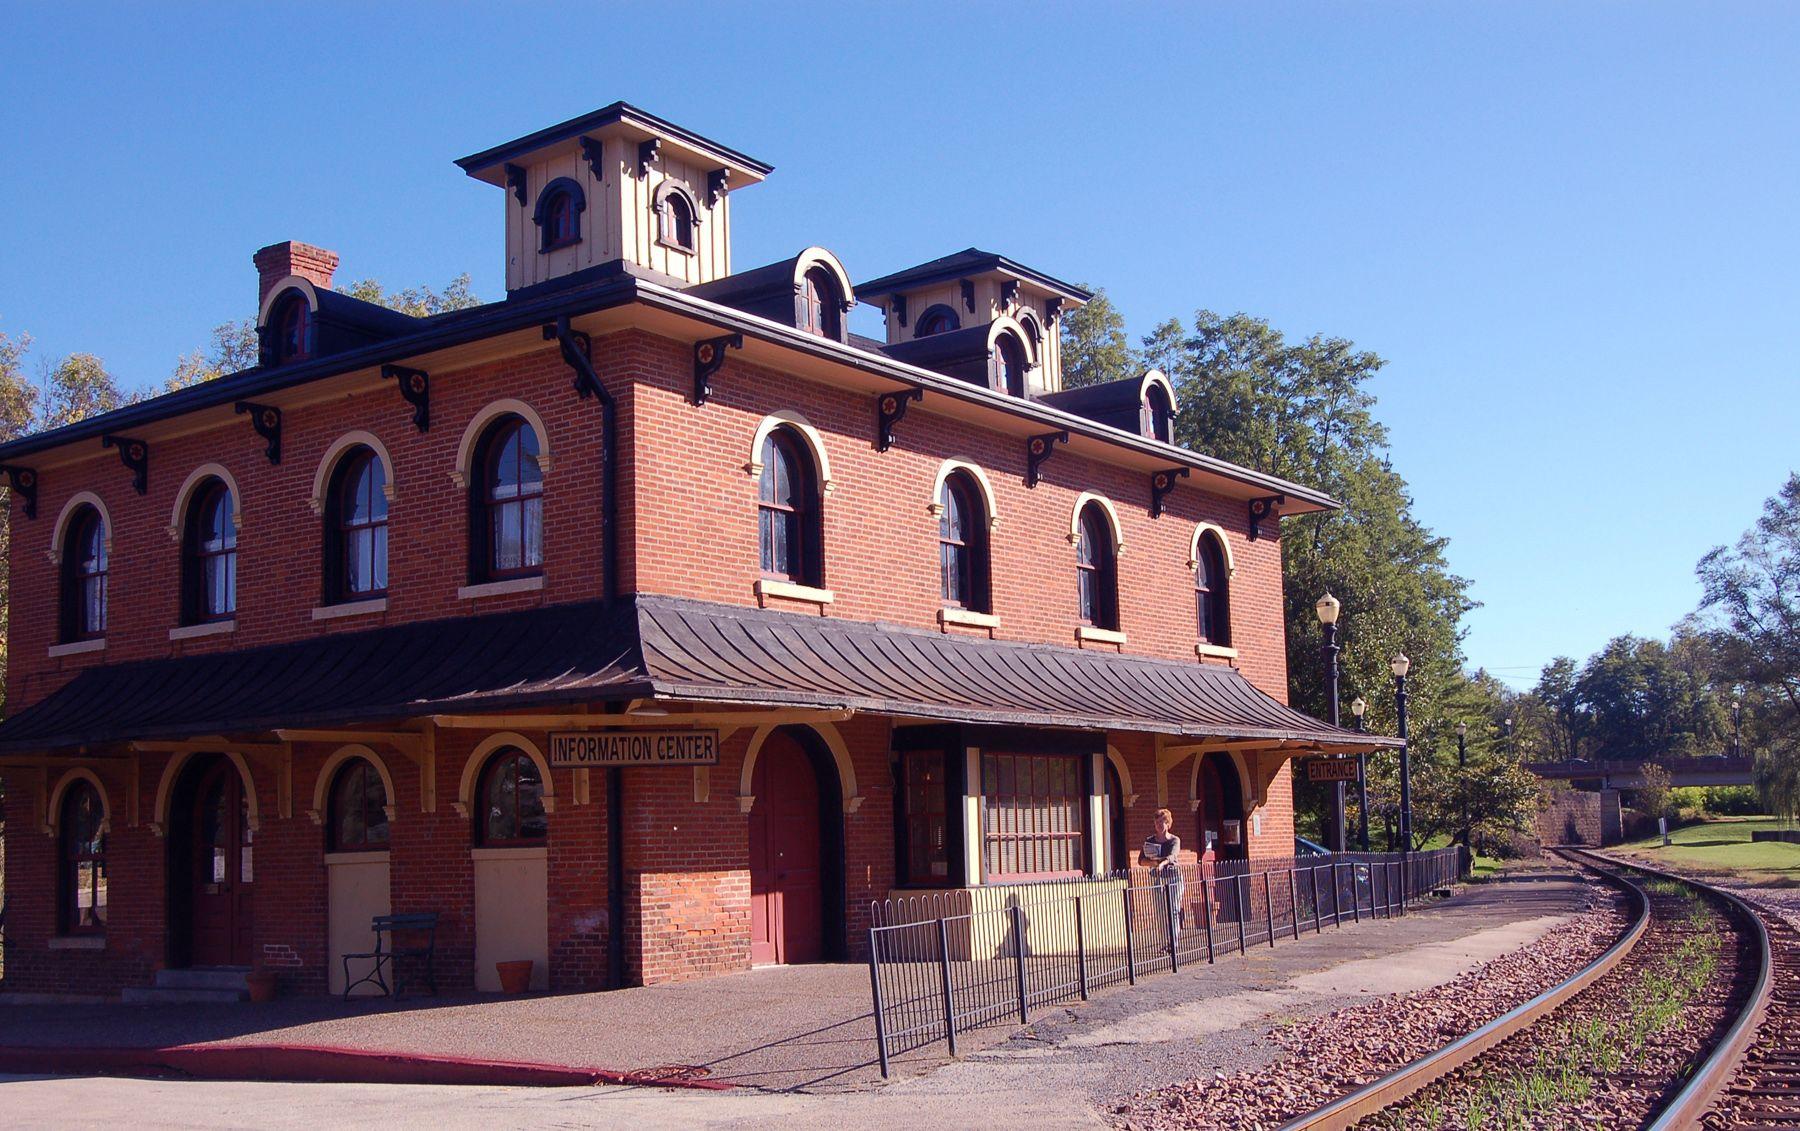 Train Depot Visitor Information Center